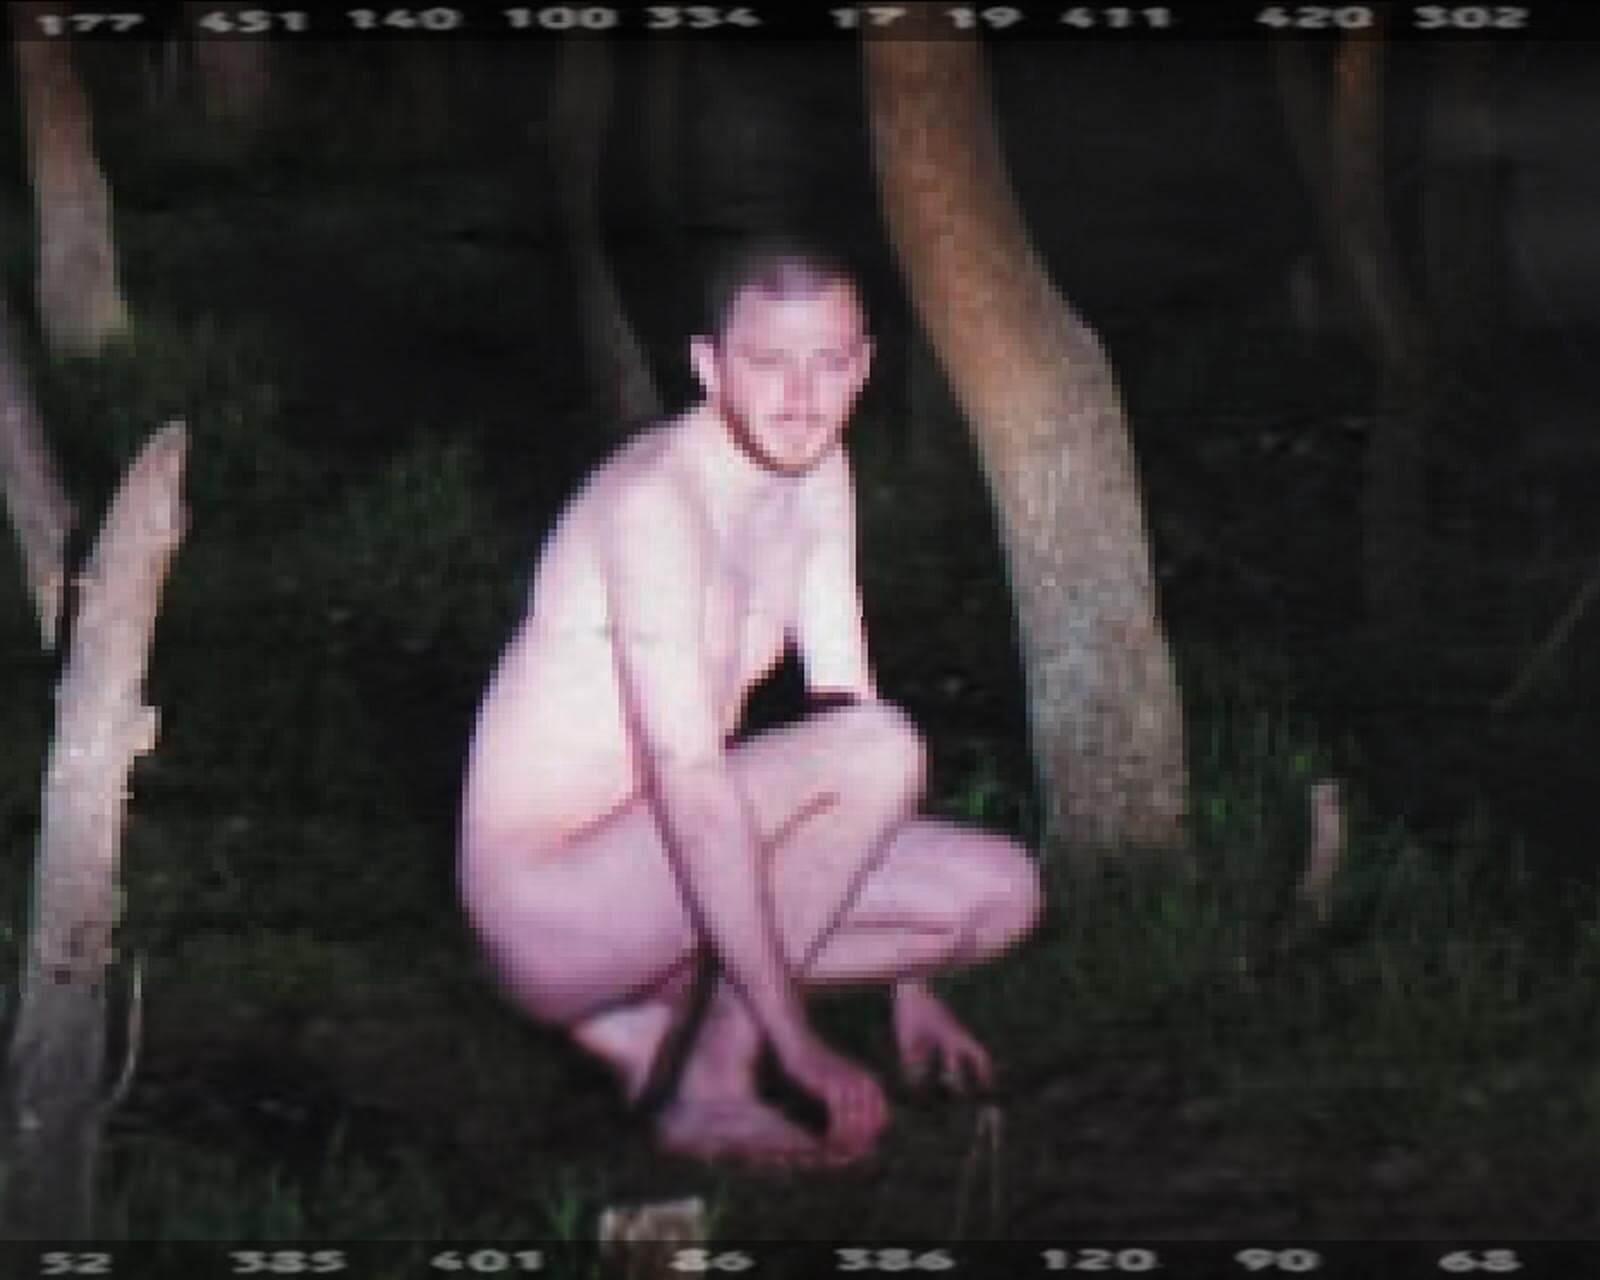 Fundamental space explorations of naked singulari_Sergey-Melnitchenko_Yogurt- Magazine1